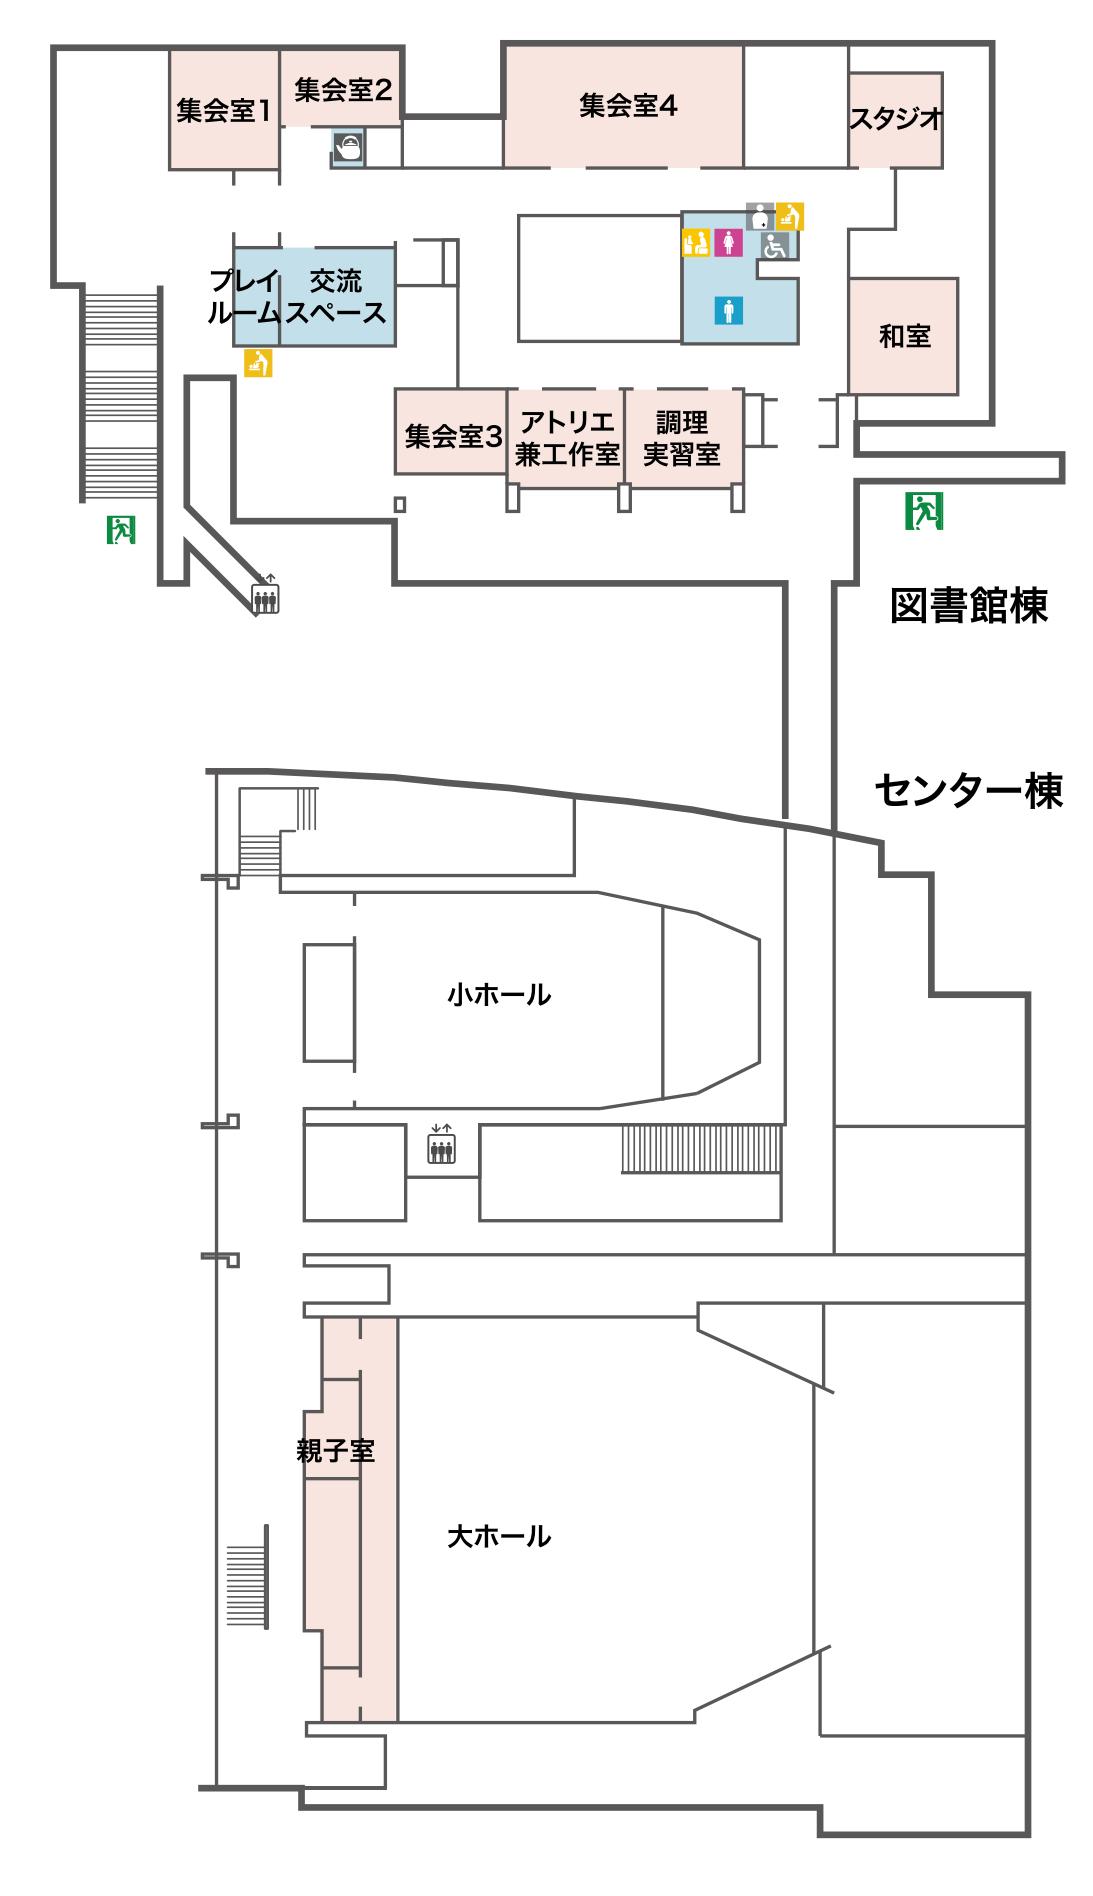 2F(センター棟・図書館棟)